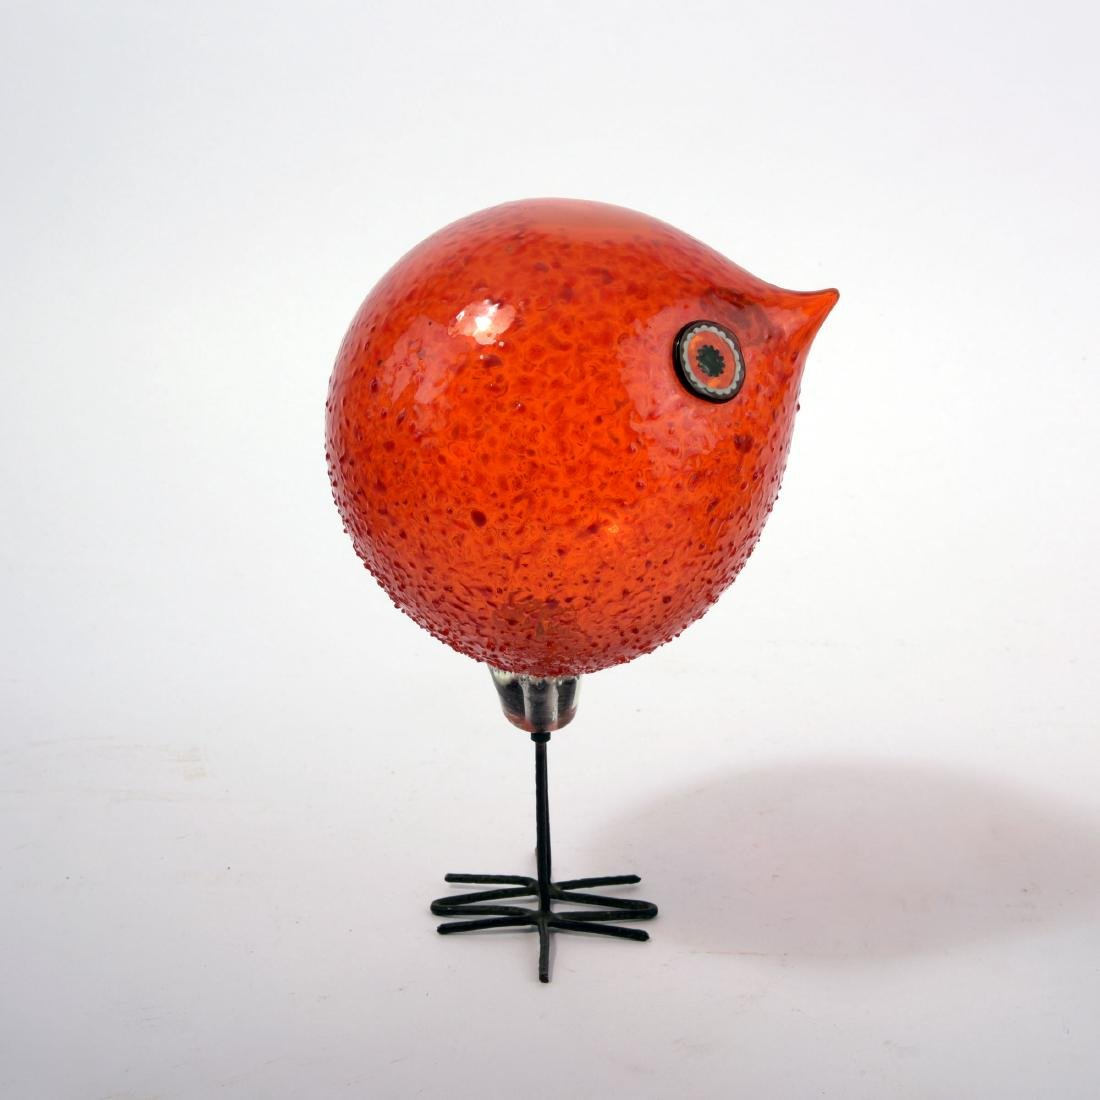 'Pulcino' bird, 1962 - 2